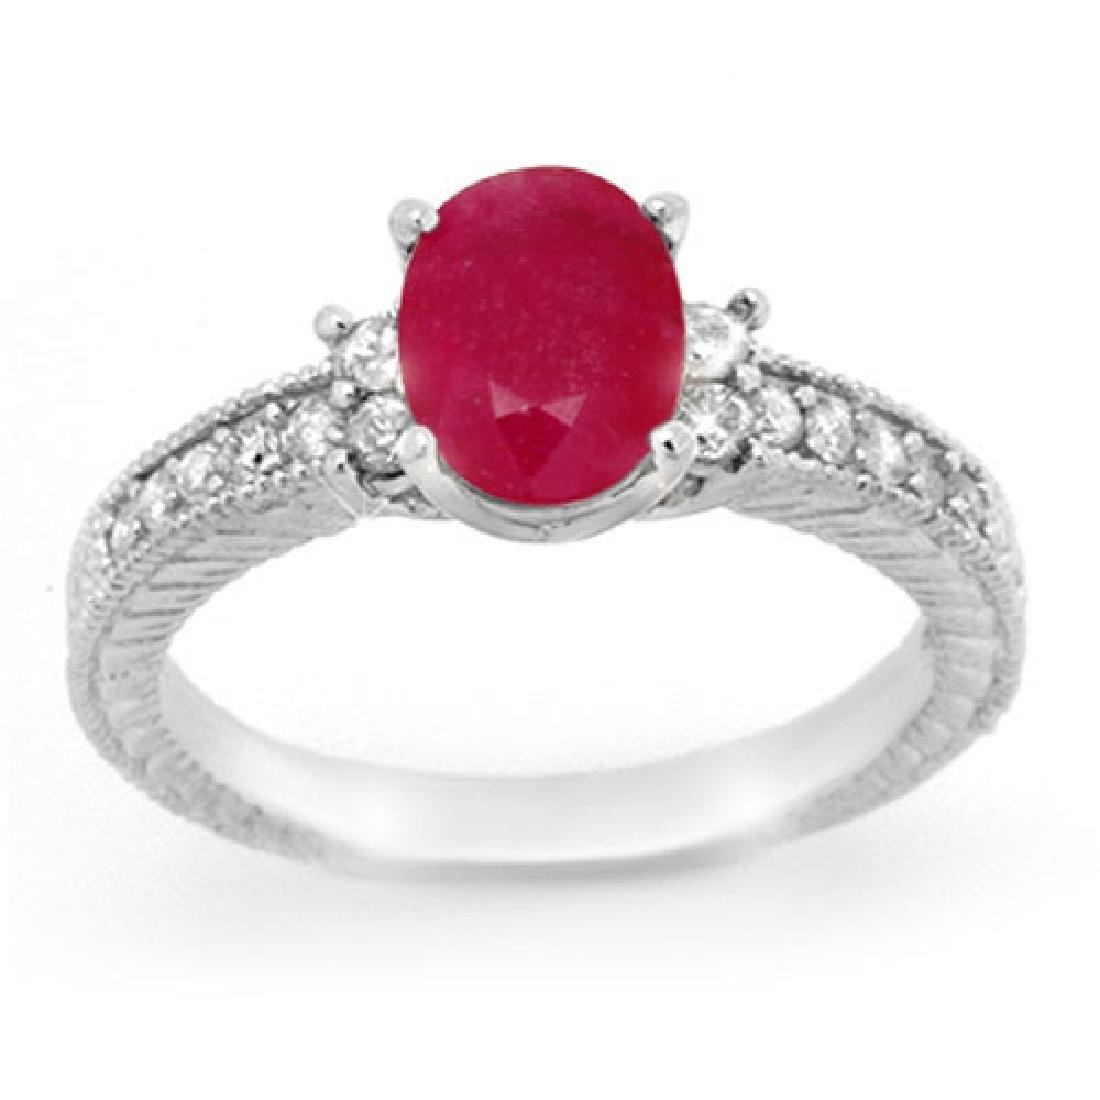 2.31 CTW Ruby & Diamond Ring 14K White Gold